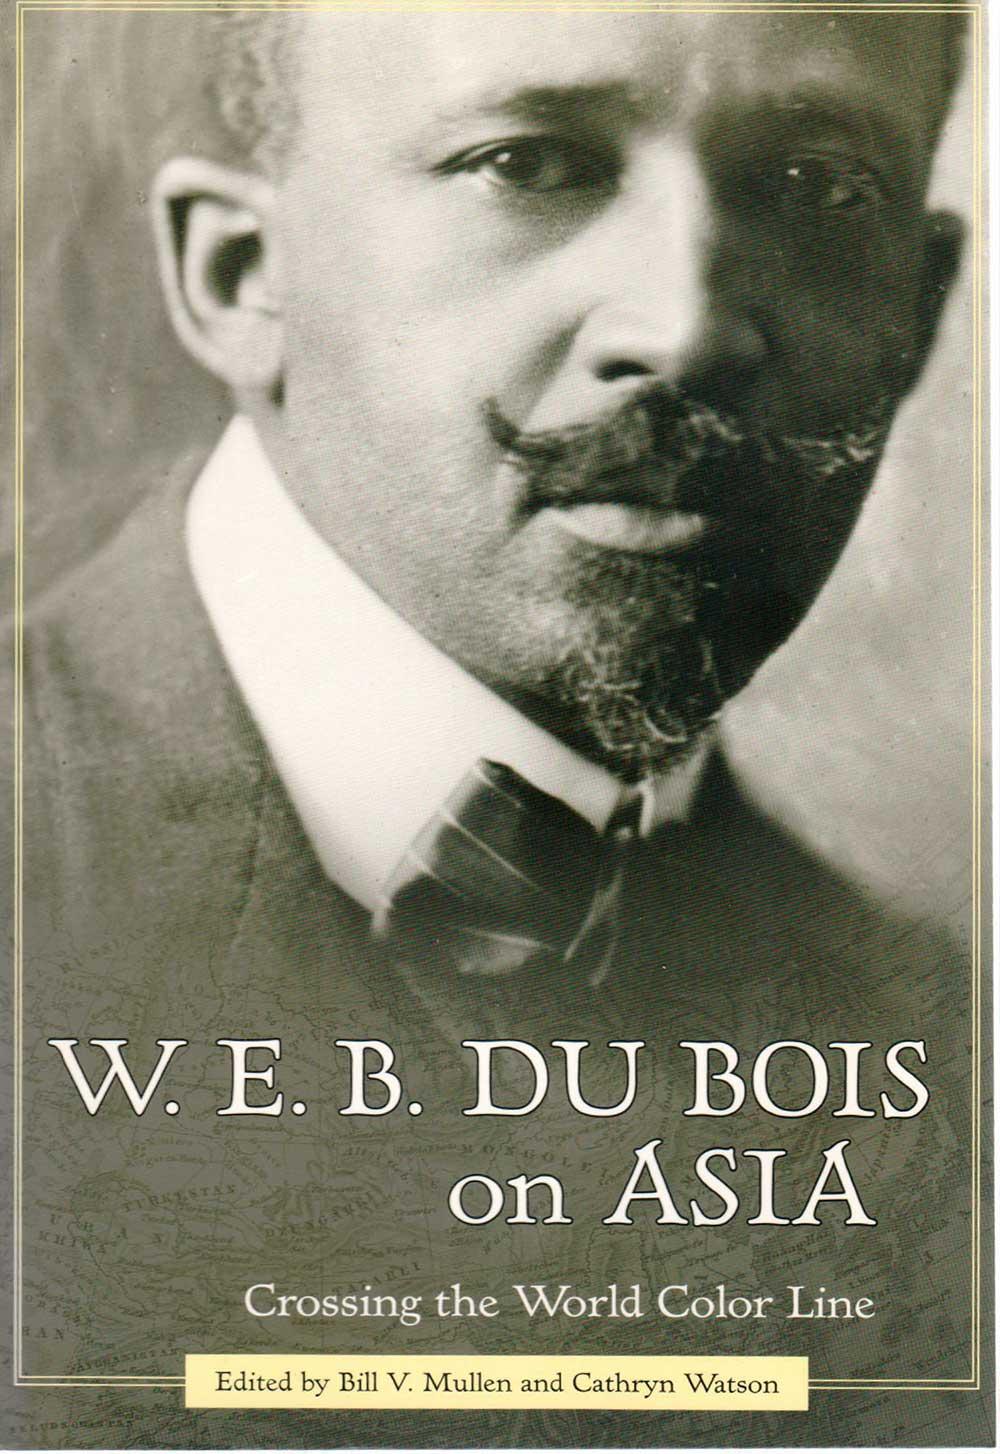 mullen-book-cover10-dubois-asia-1000px.jpg